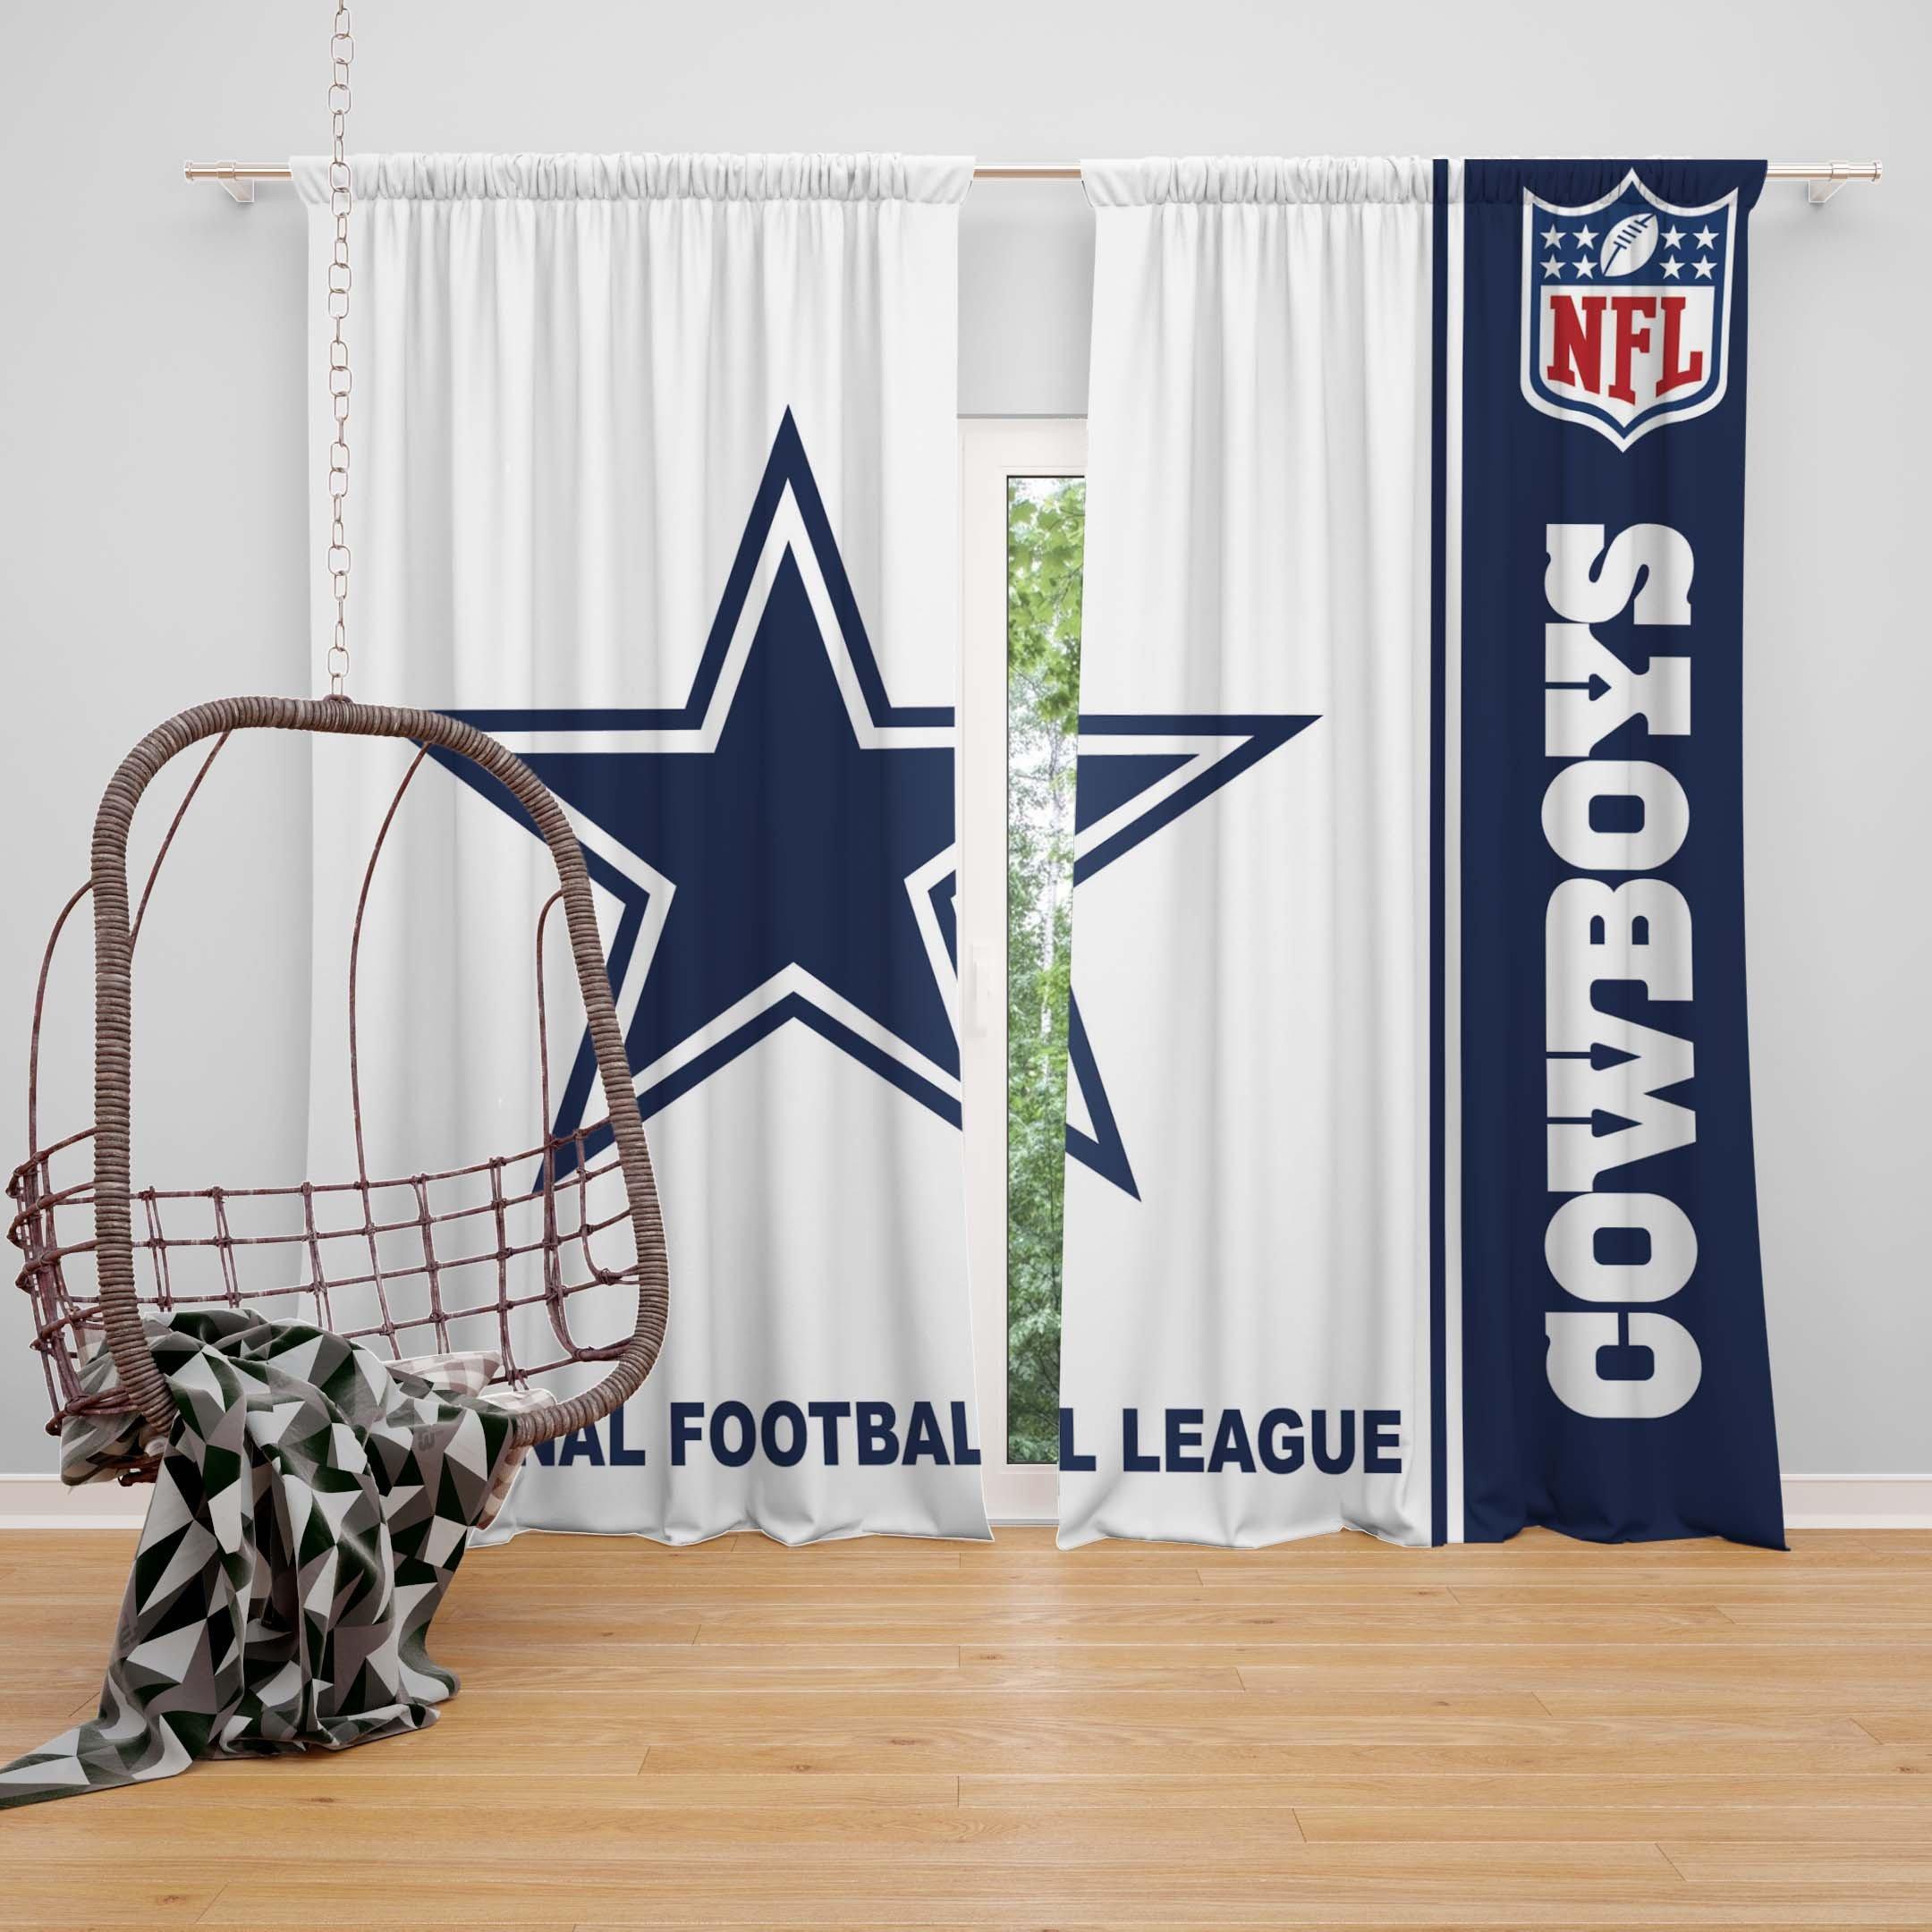 Dallas Cowboy Bedroom Set Inspirational Nfl Dallas Cowboys Bedroom Curtain